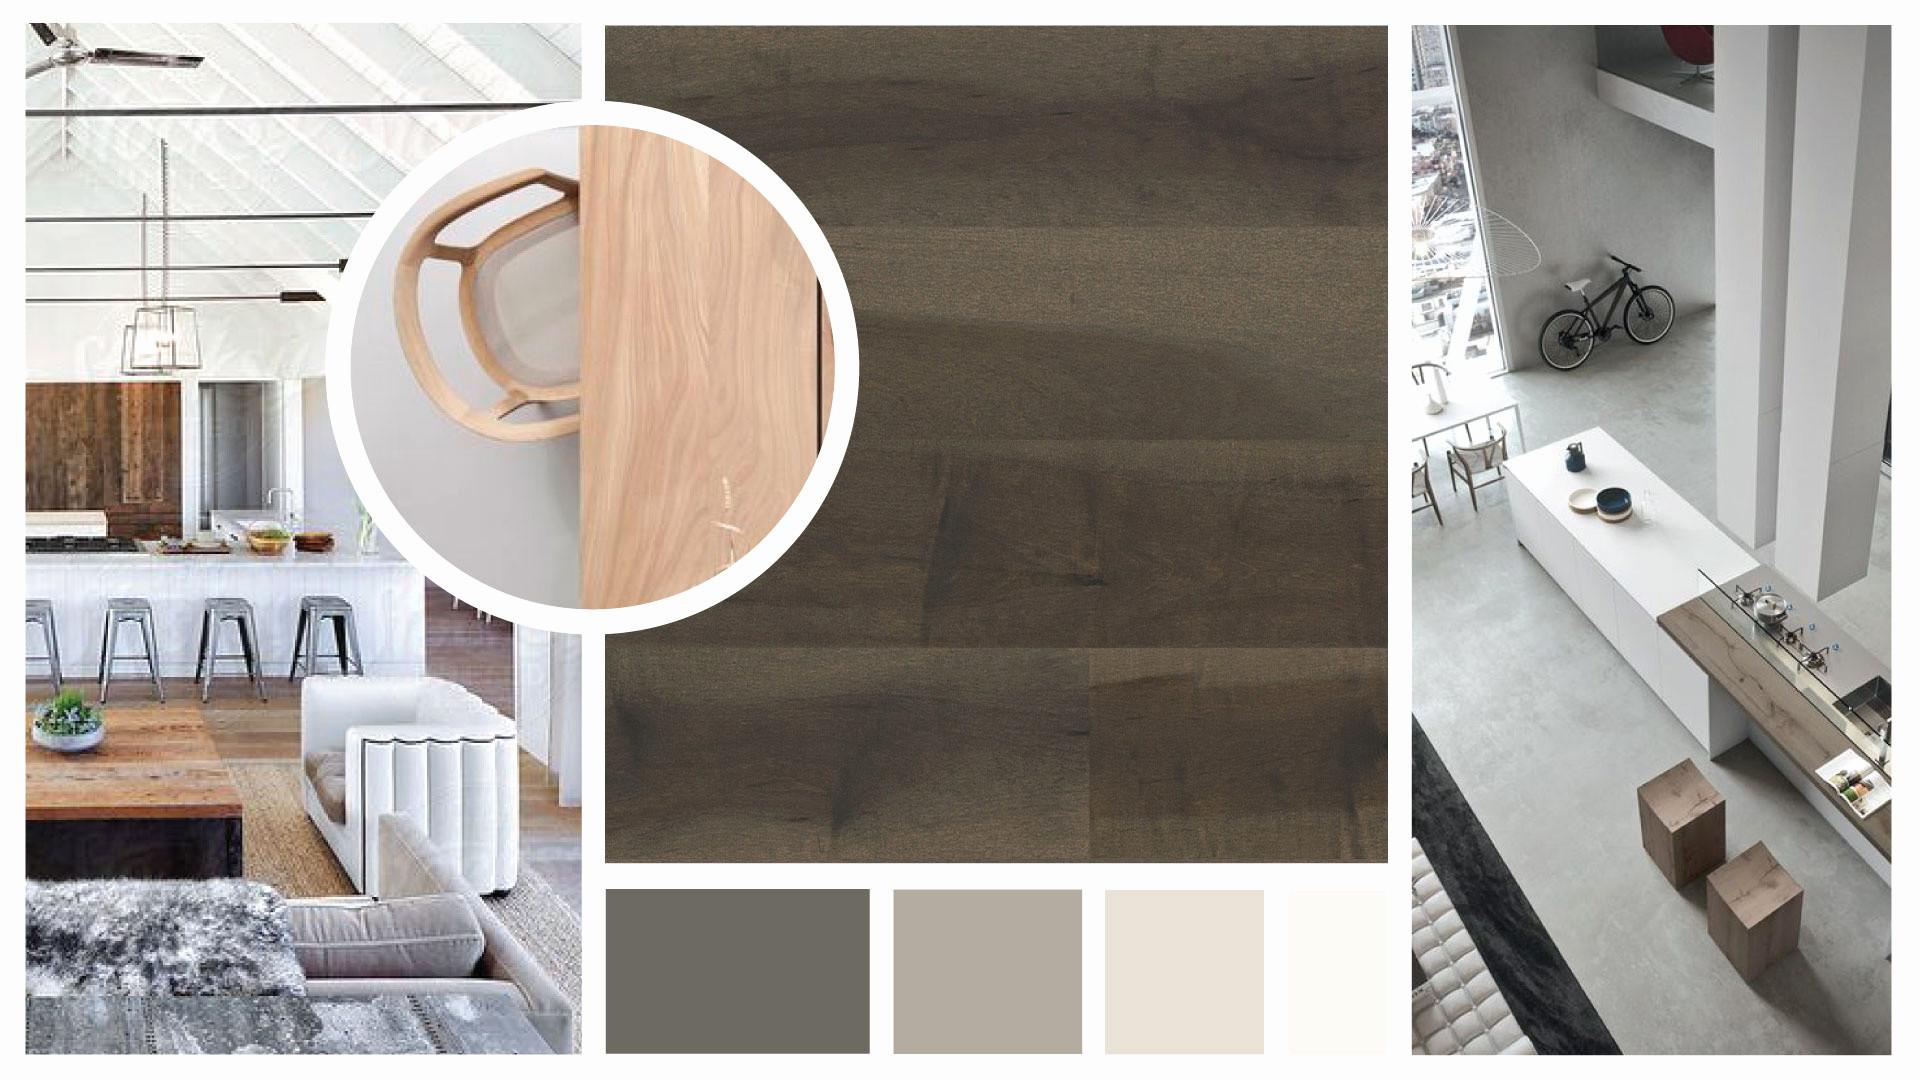 hardwood floor cleaning tulsa of wlcu page 217 best home design ideas regarding 2017 wood flooring trends new 4 latest hardwood flooring trends